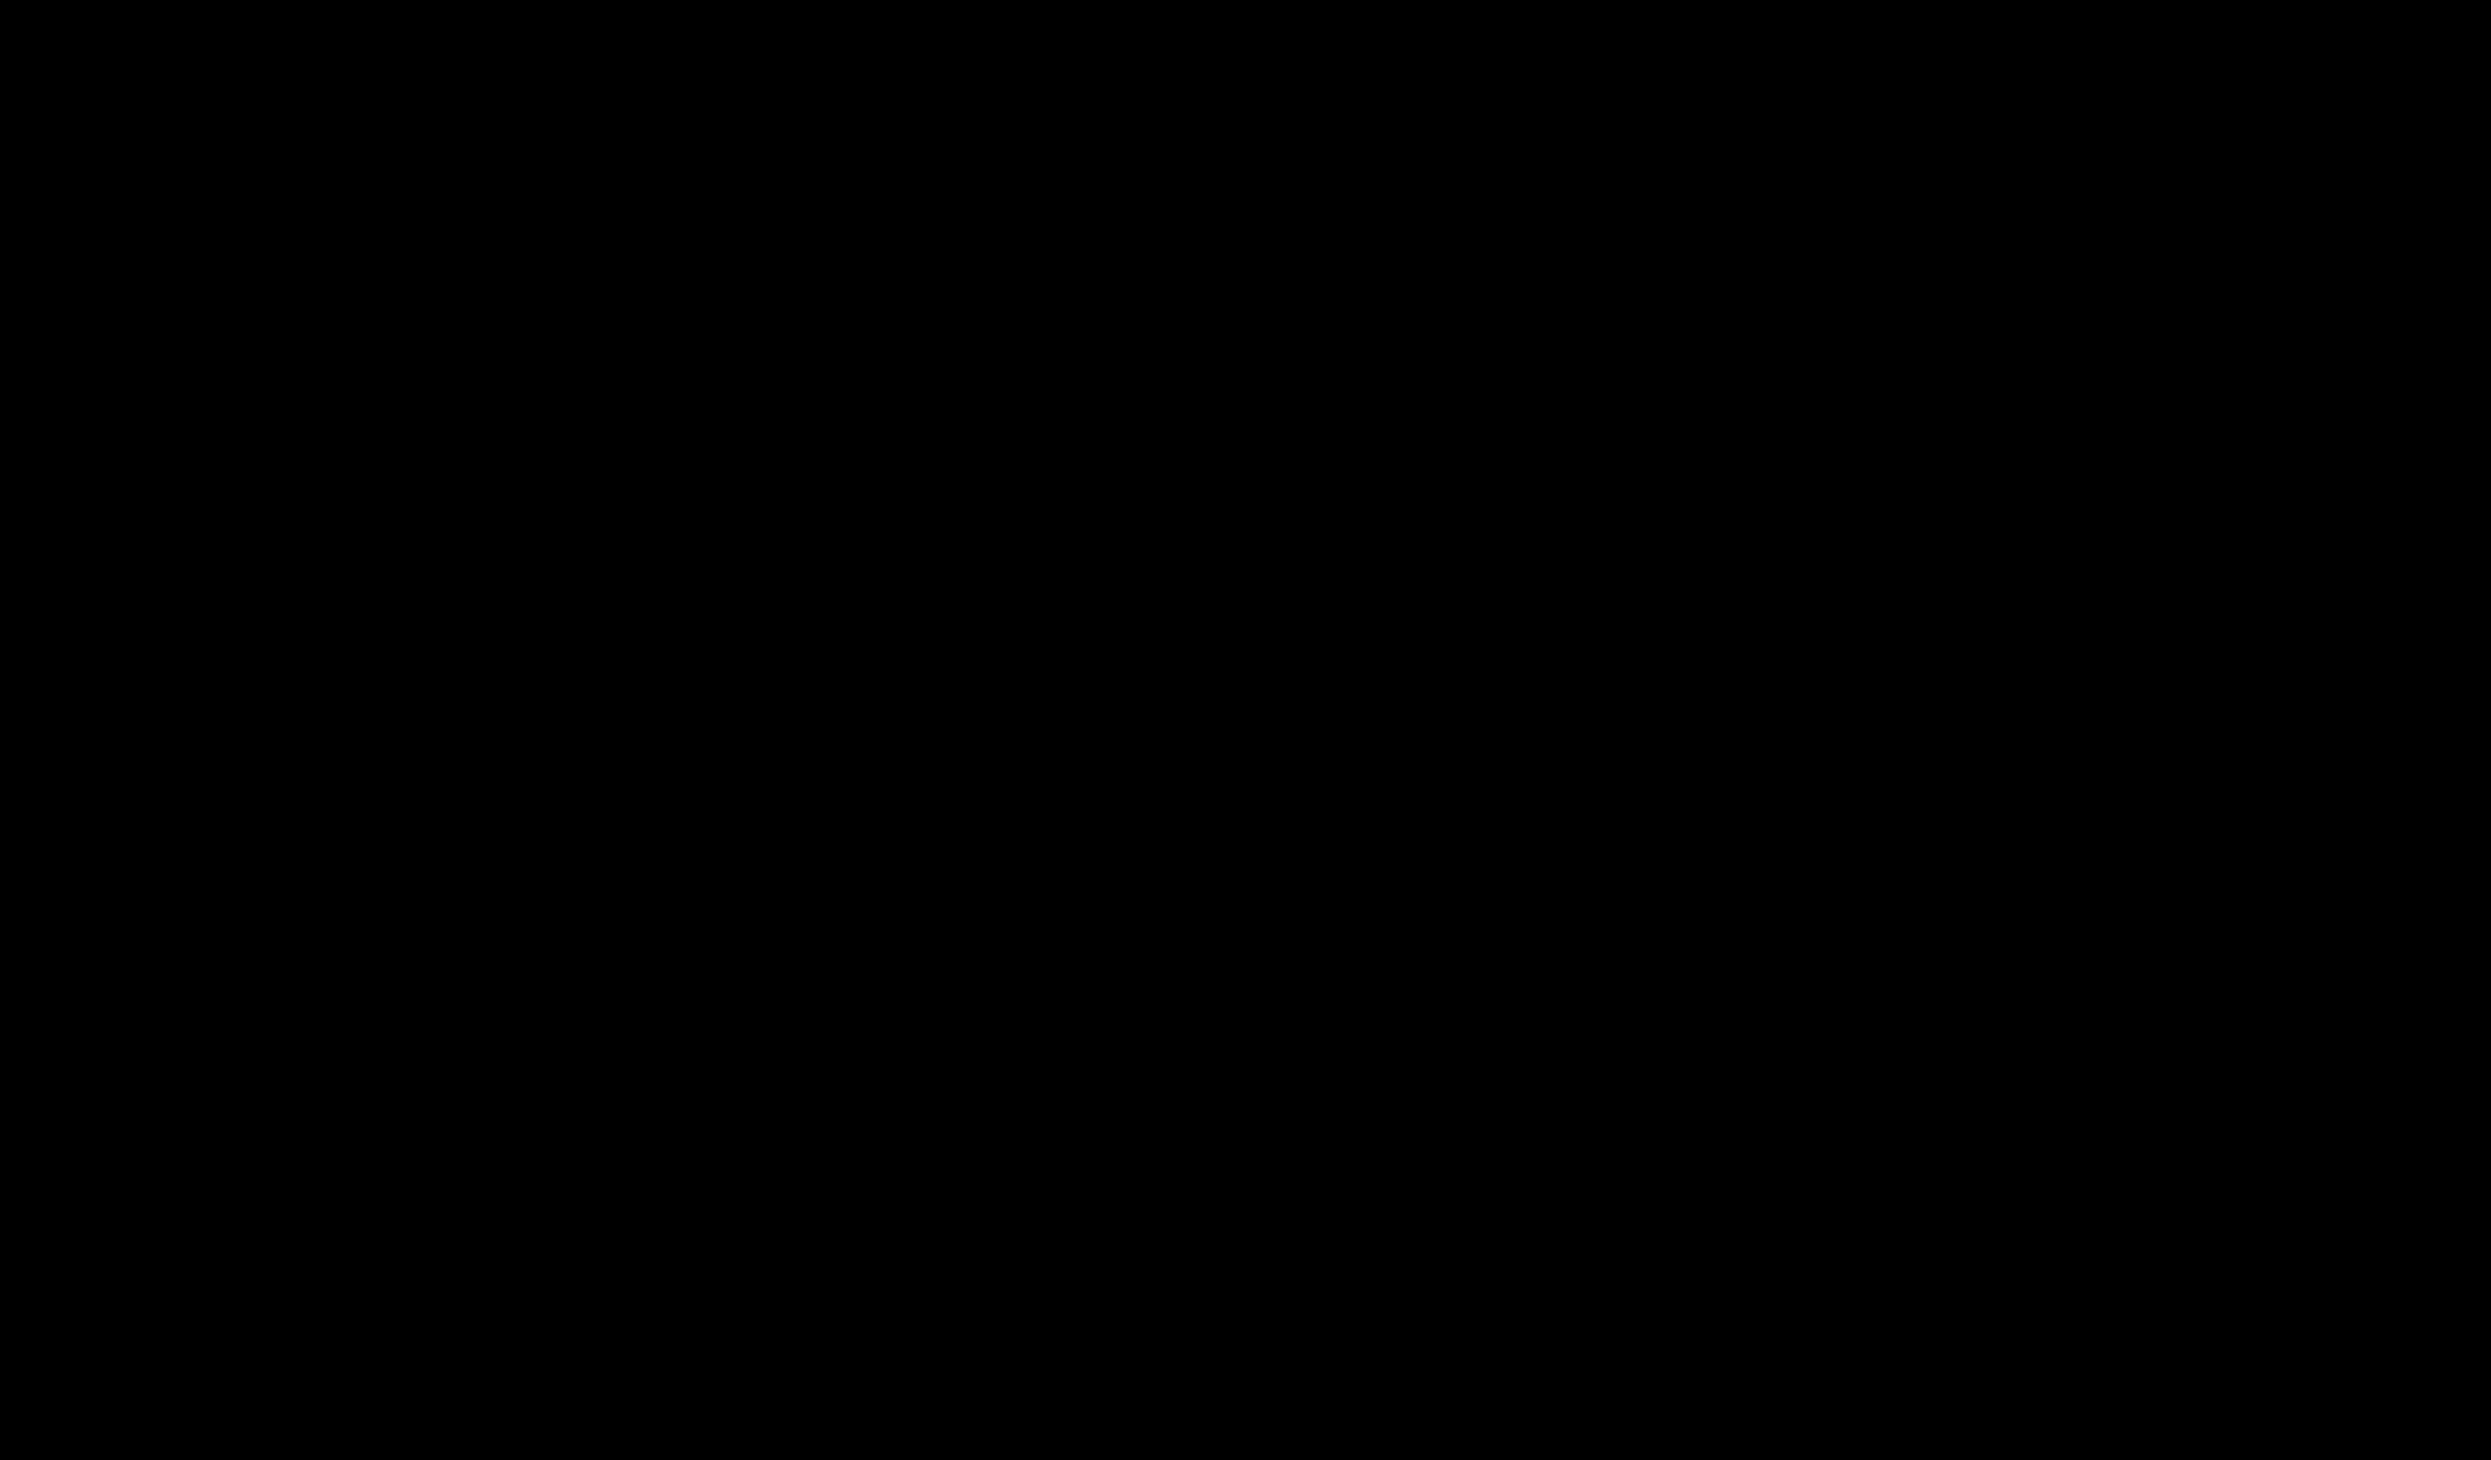 Bis-MAL-Lysine-dPEG®₄-dPEG®₁₂-Tris(-dPEG®₂₄-acid)₃